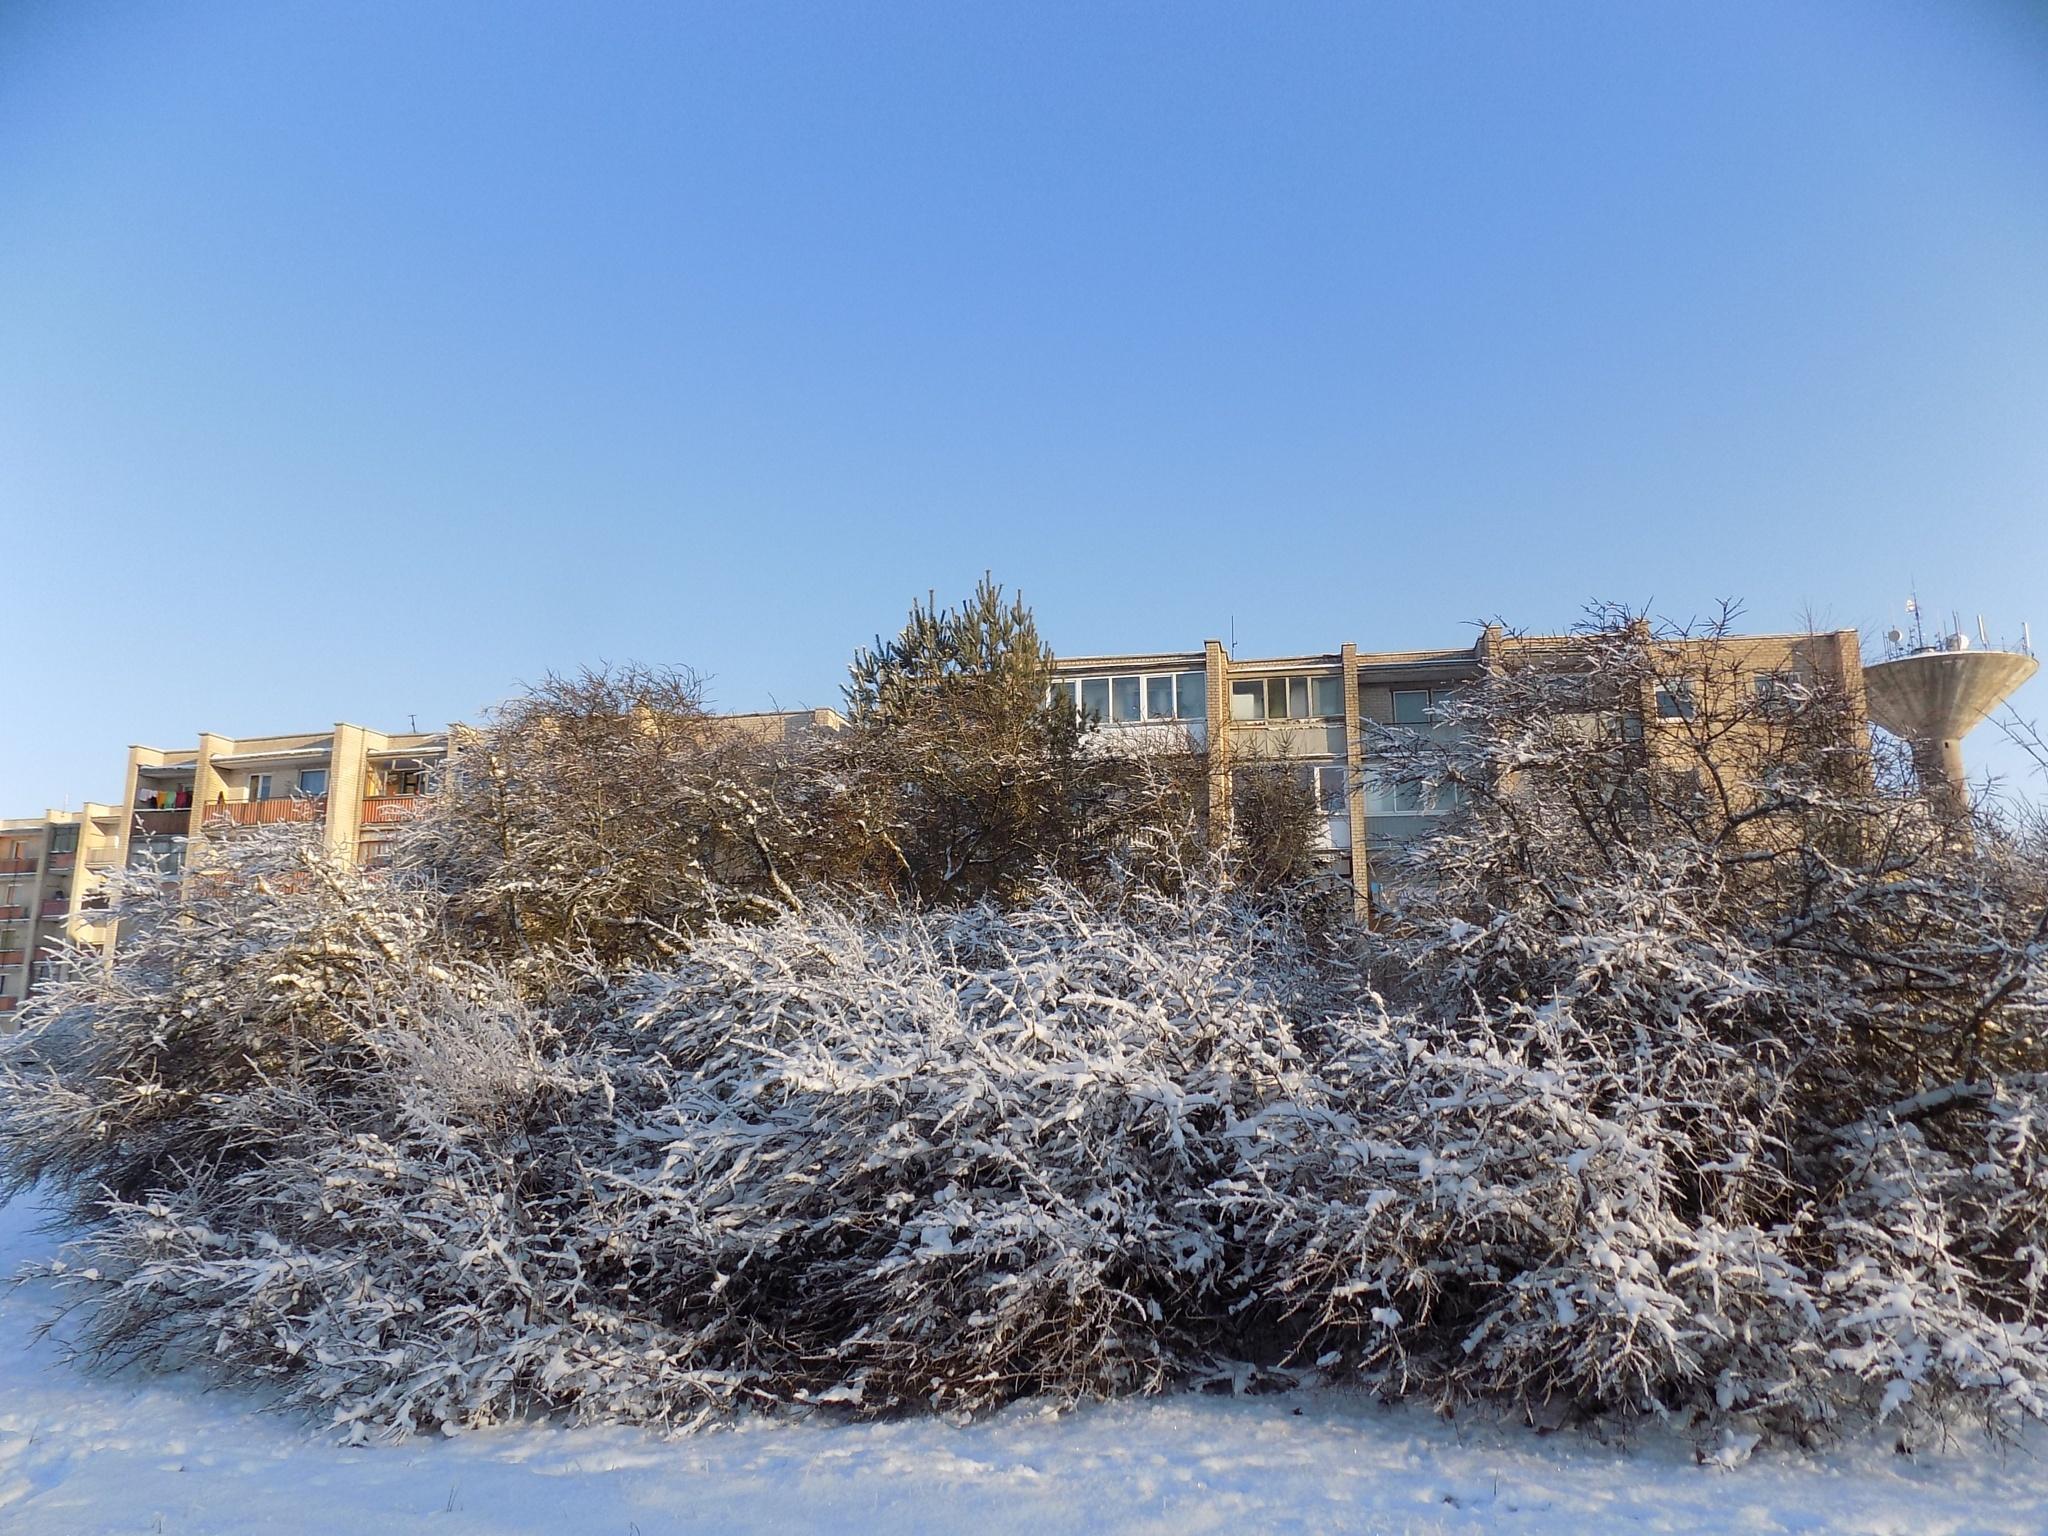 Winter day by uzkuraitiene62